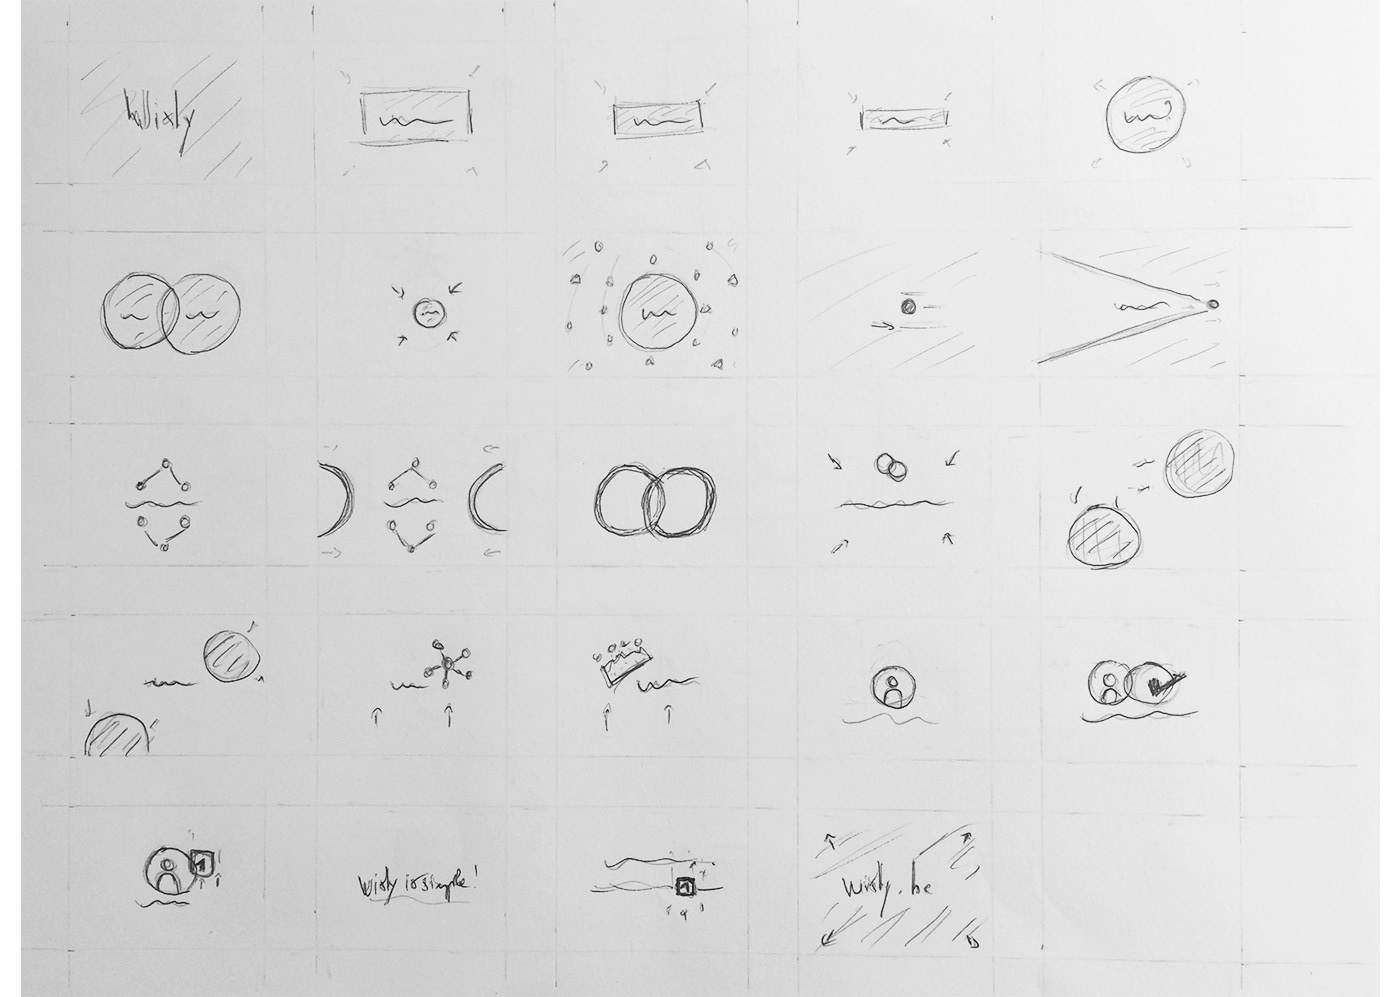 Image may contain: handwriting, drawing and outdoor